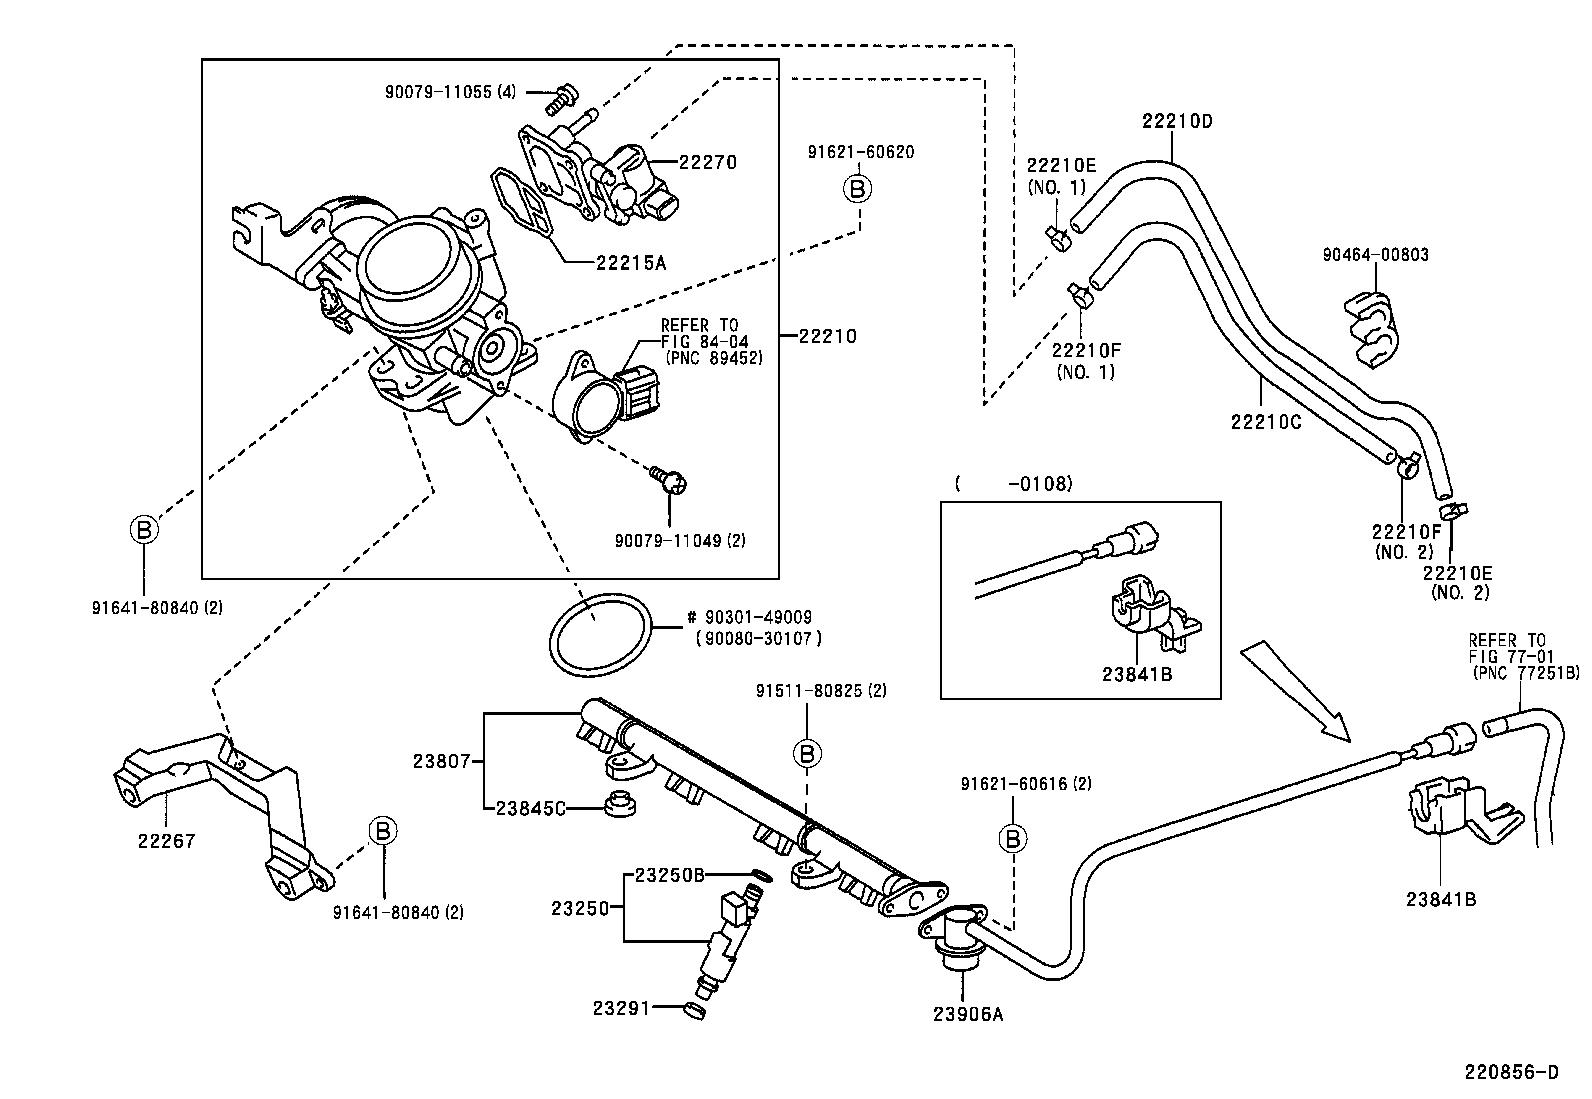 Mazda B2000 Fuel Pump Relay Wiring Diagram 1989 Mazda